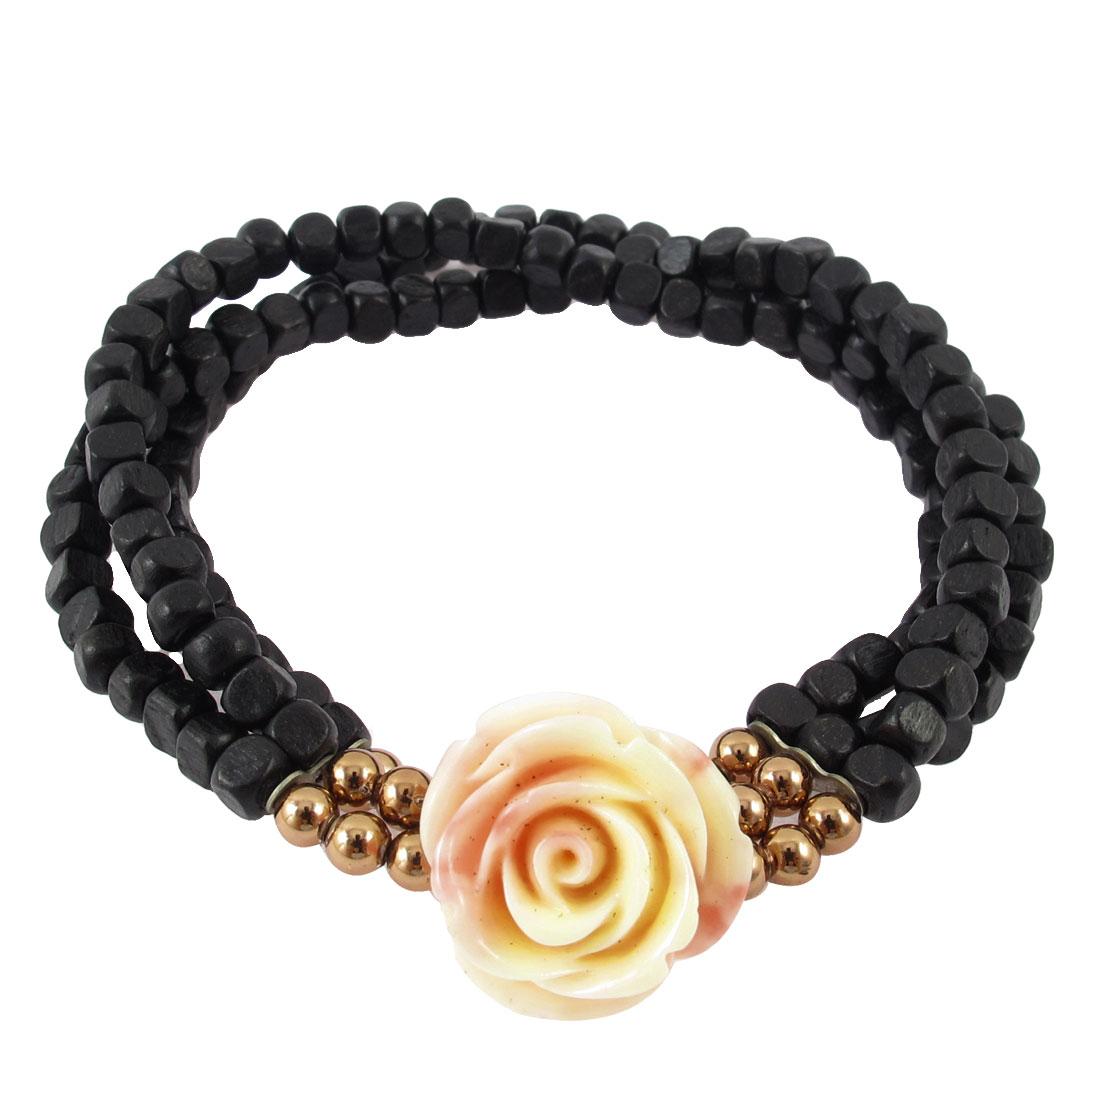 Wintersweet Pendant Square Beads Adorn 3 Layers Elastic Bracelet Gift Black